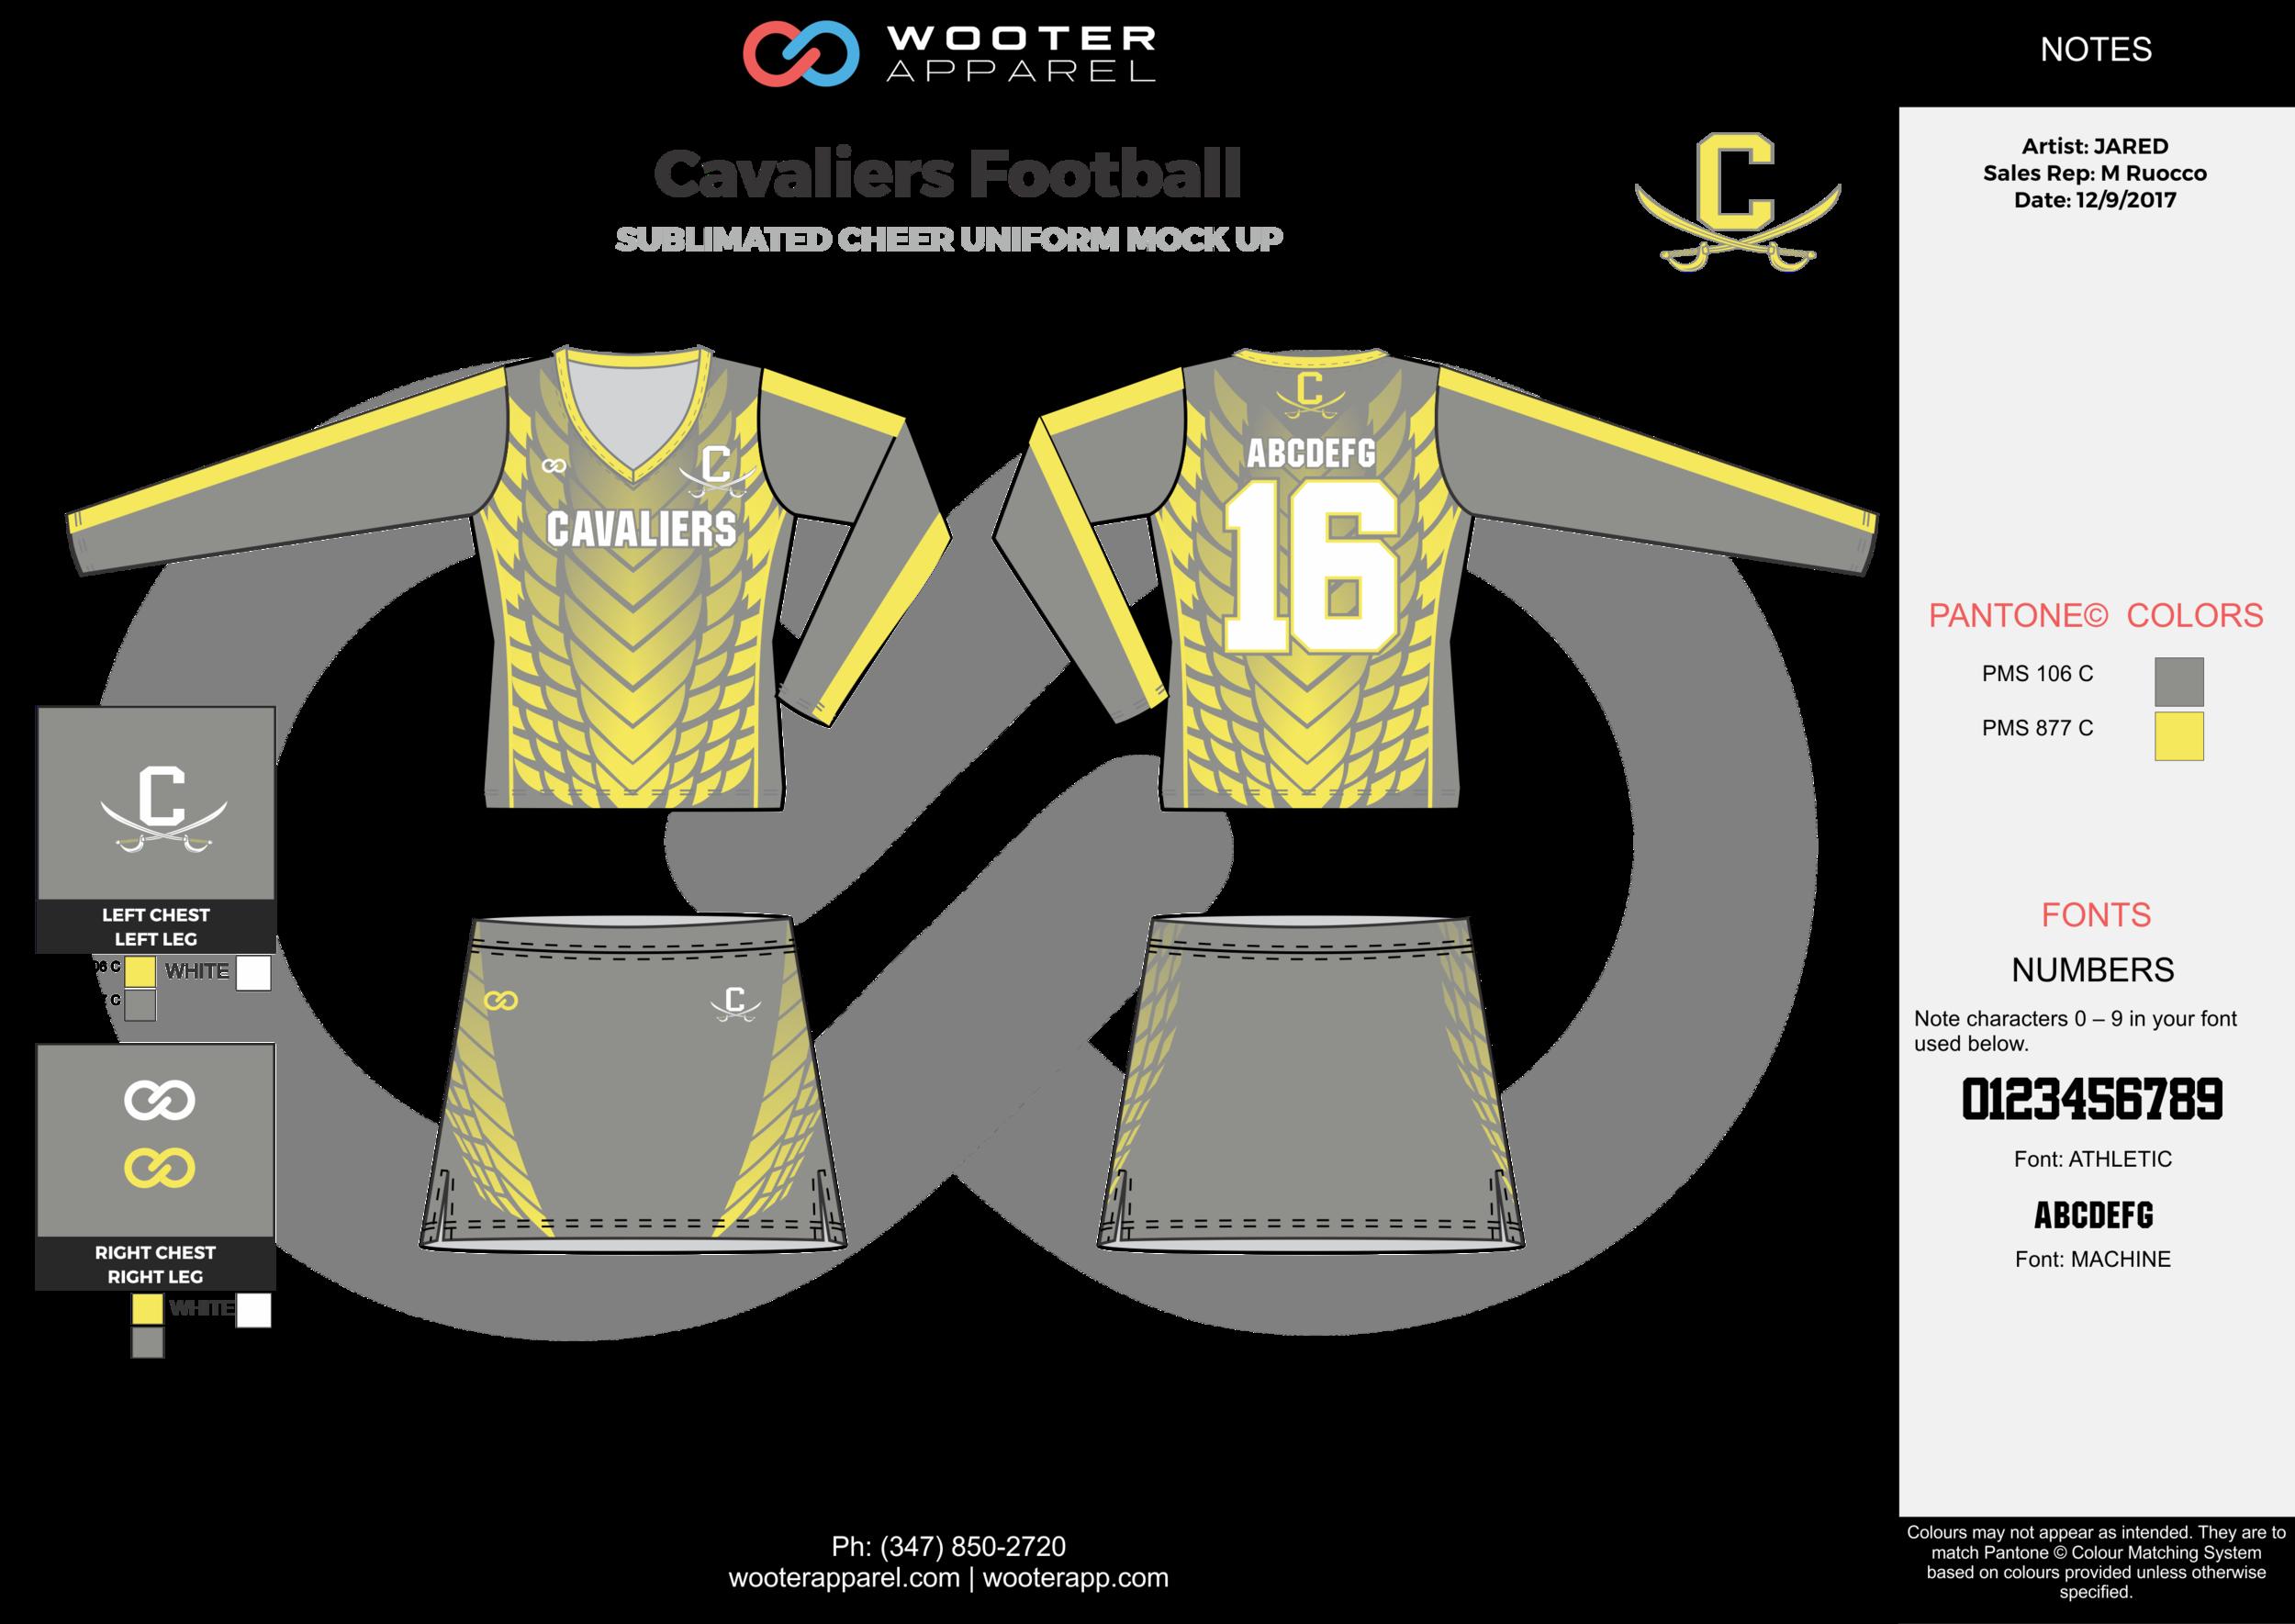 Cavallers Football yellow gray white football uniforms jerseys skirts